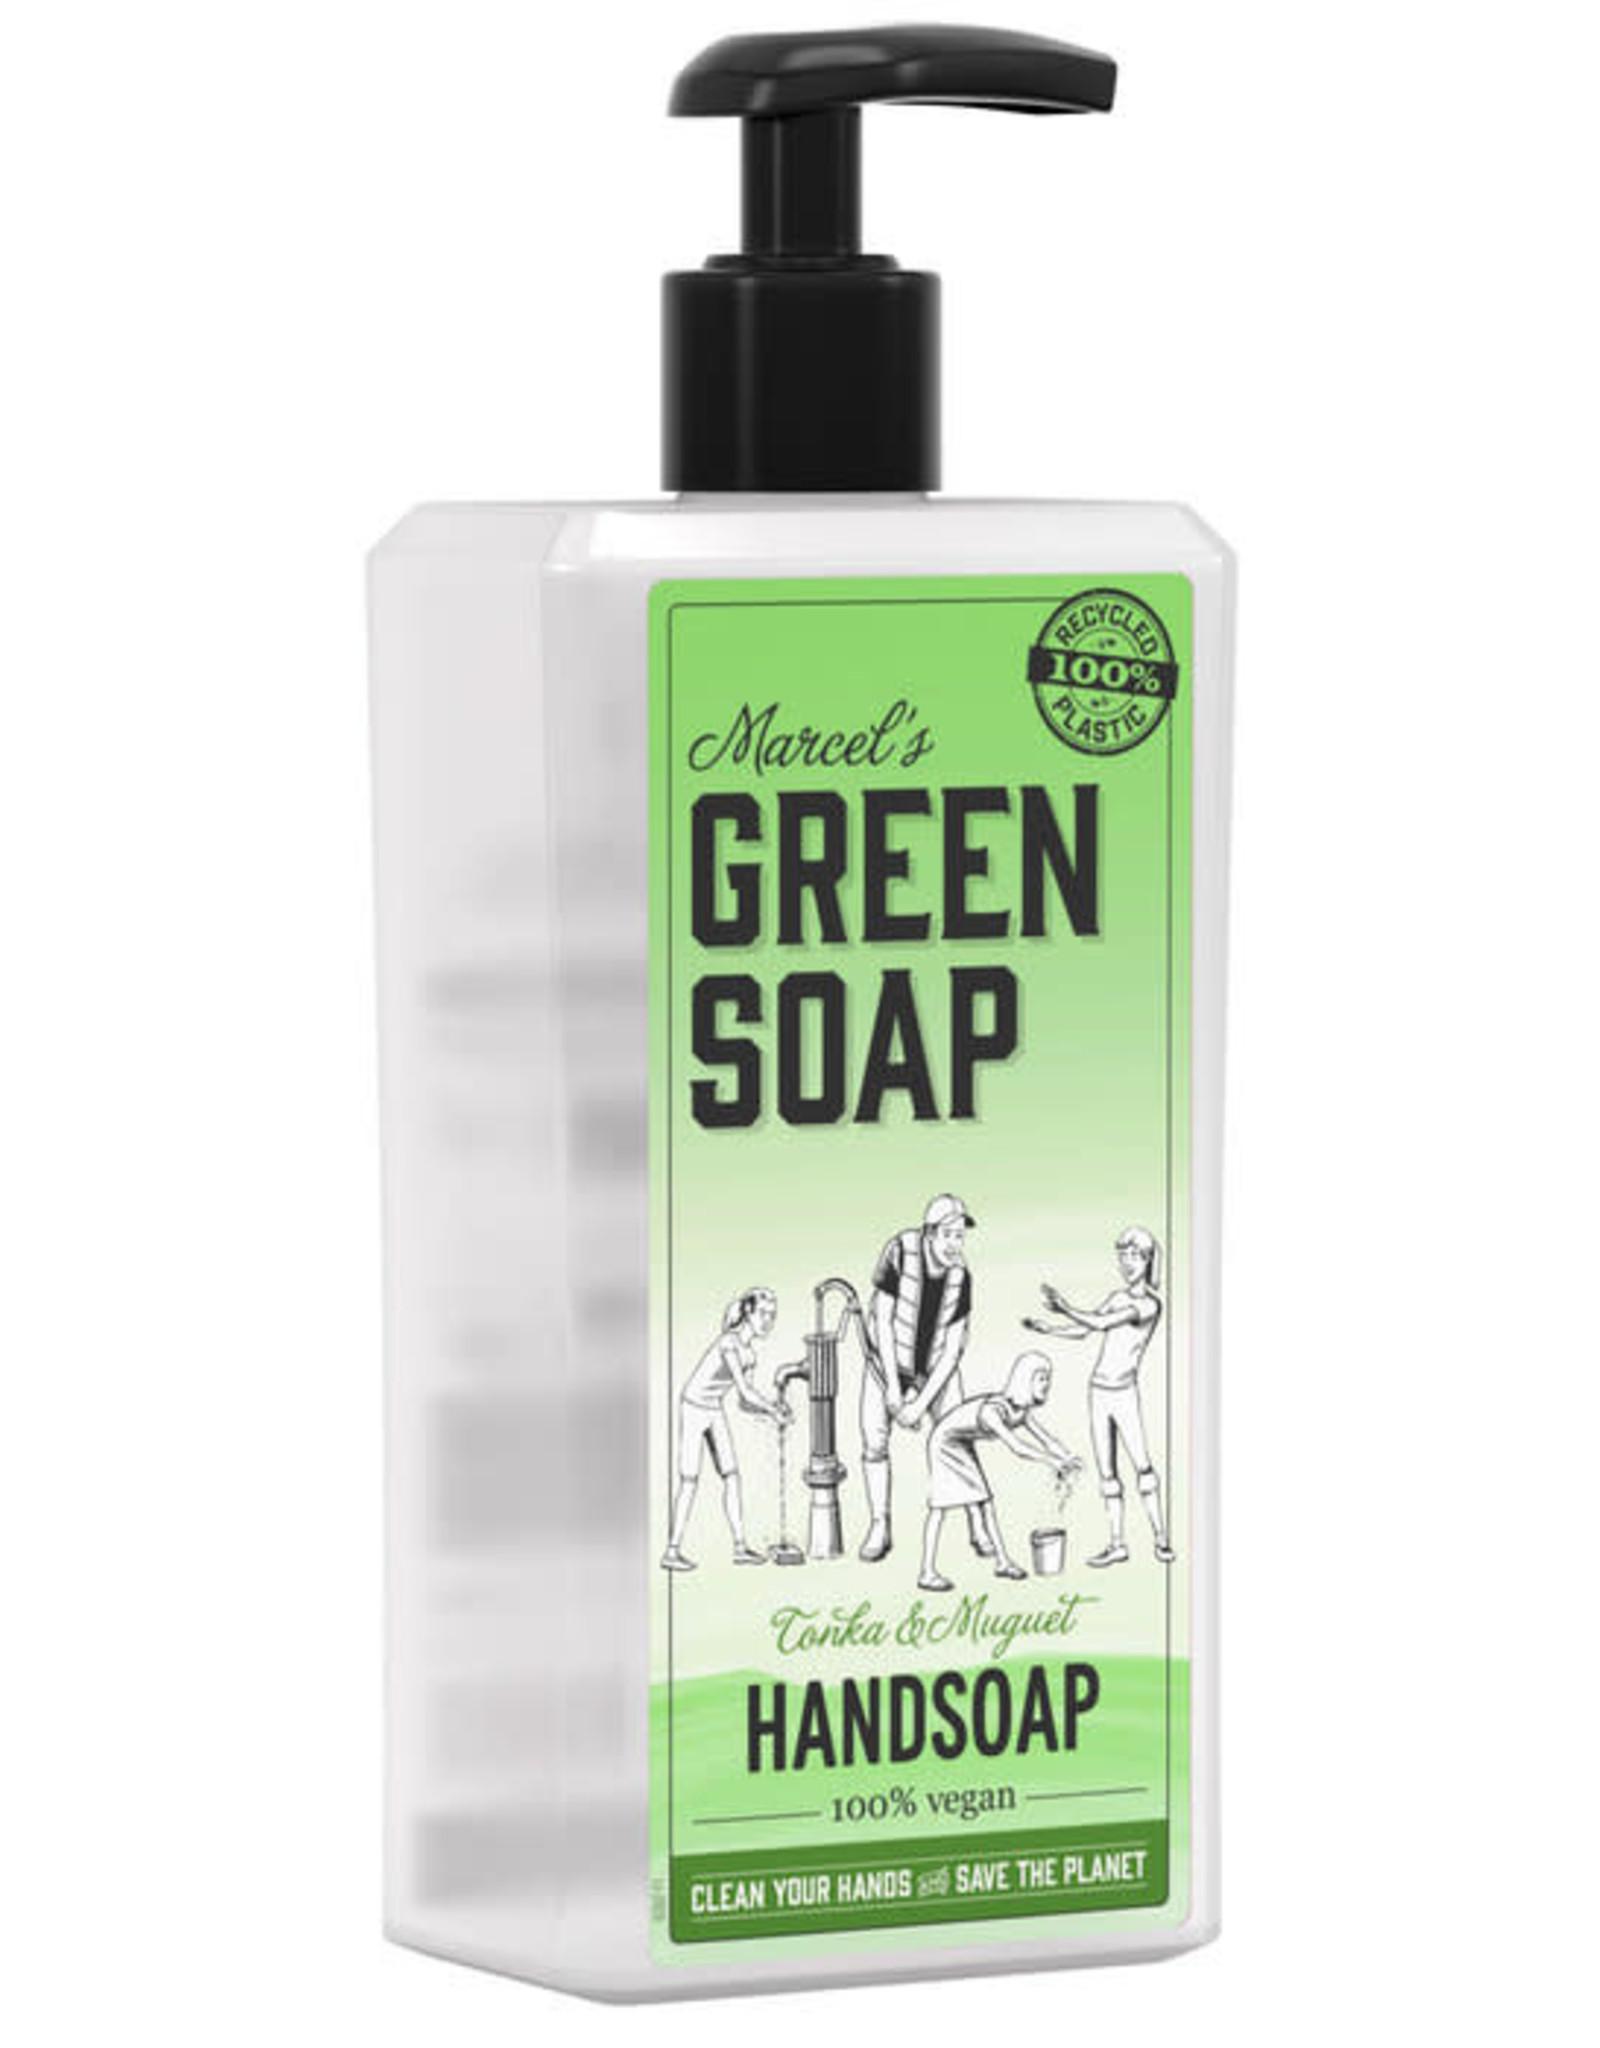 Marcel's Green Soap Handsoap Tonka & Muguet 500 ml